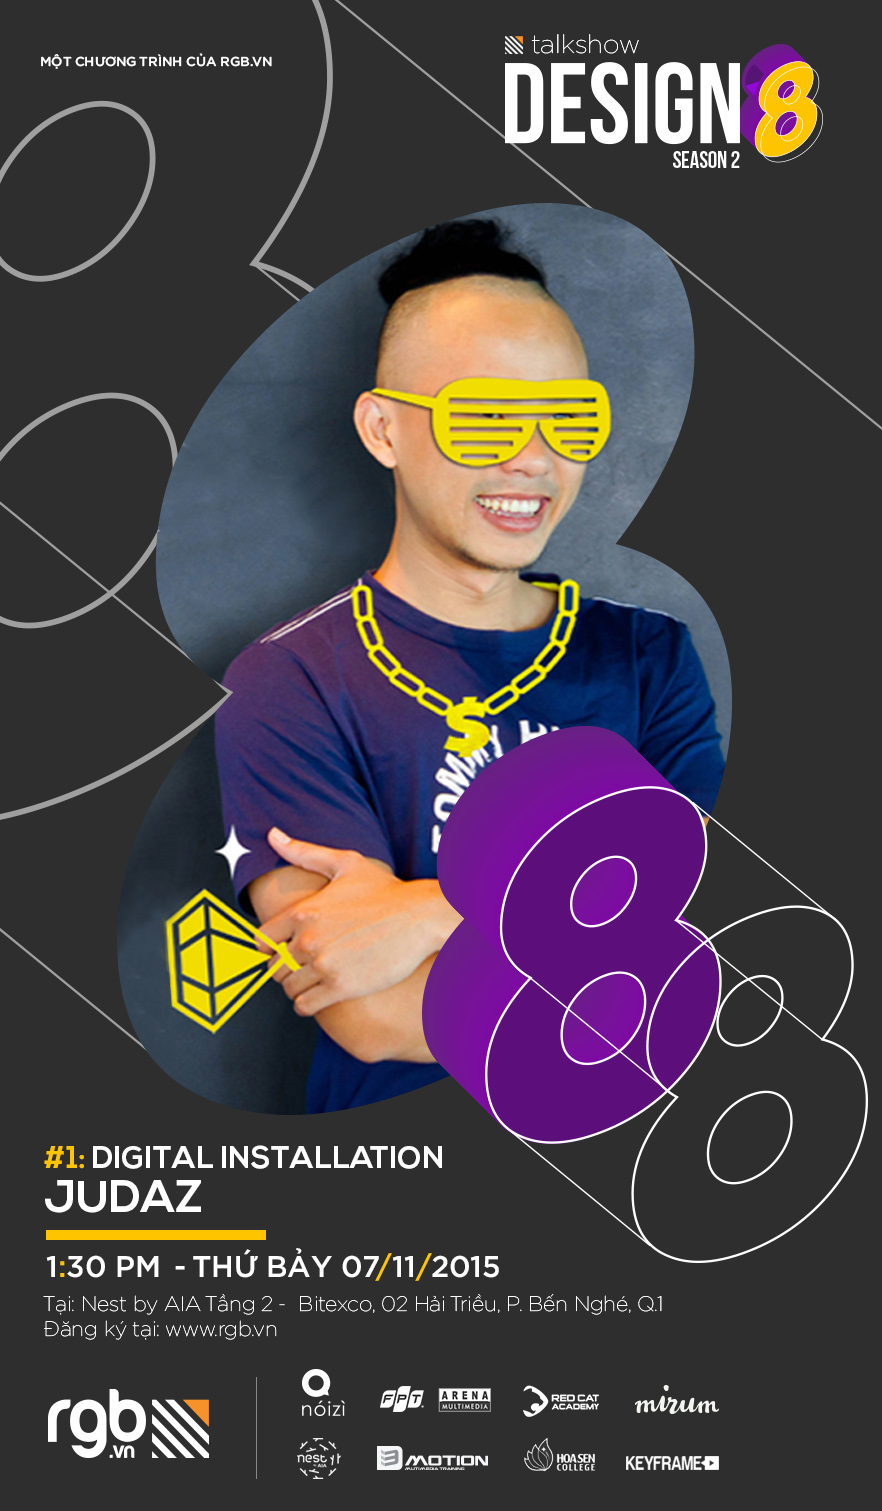 RGB_design8_talkshow_digital_installation_judaz